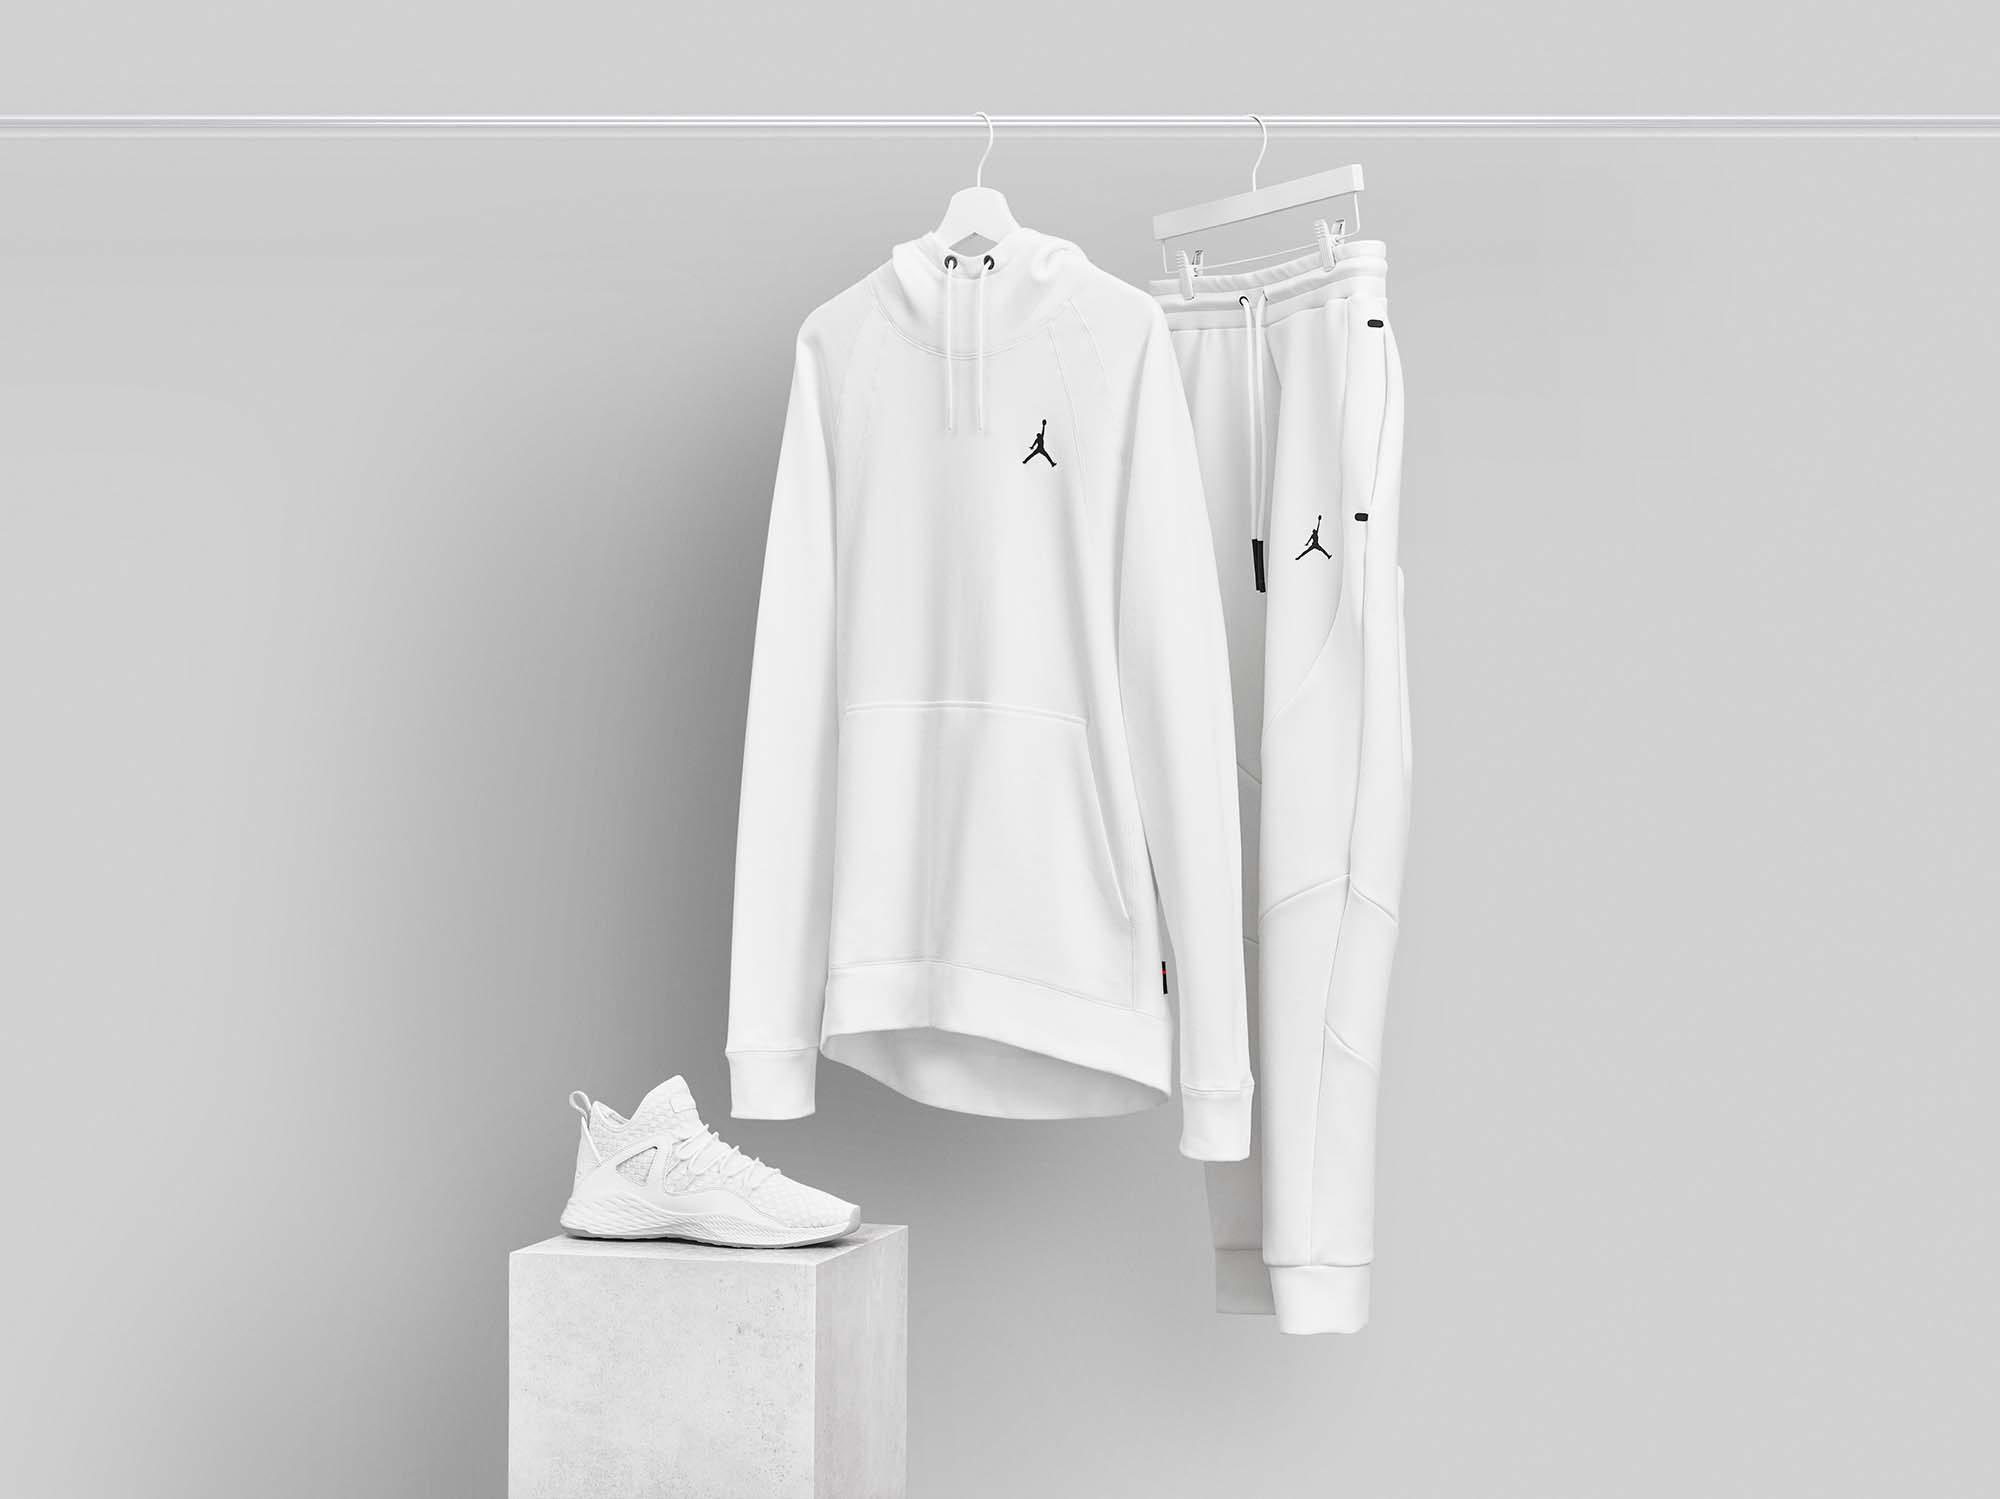 jordan-brand-2017-aw-clothing-collection-010